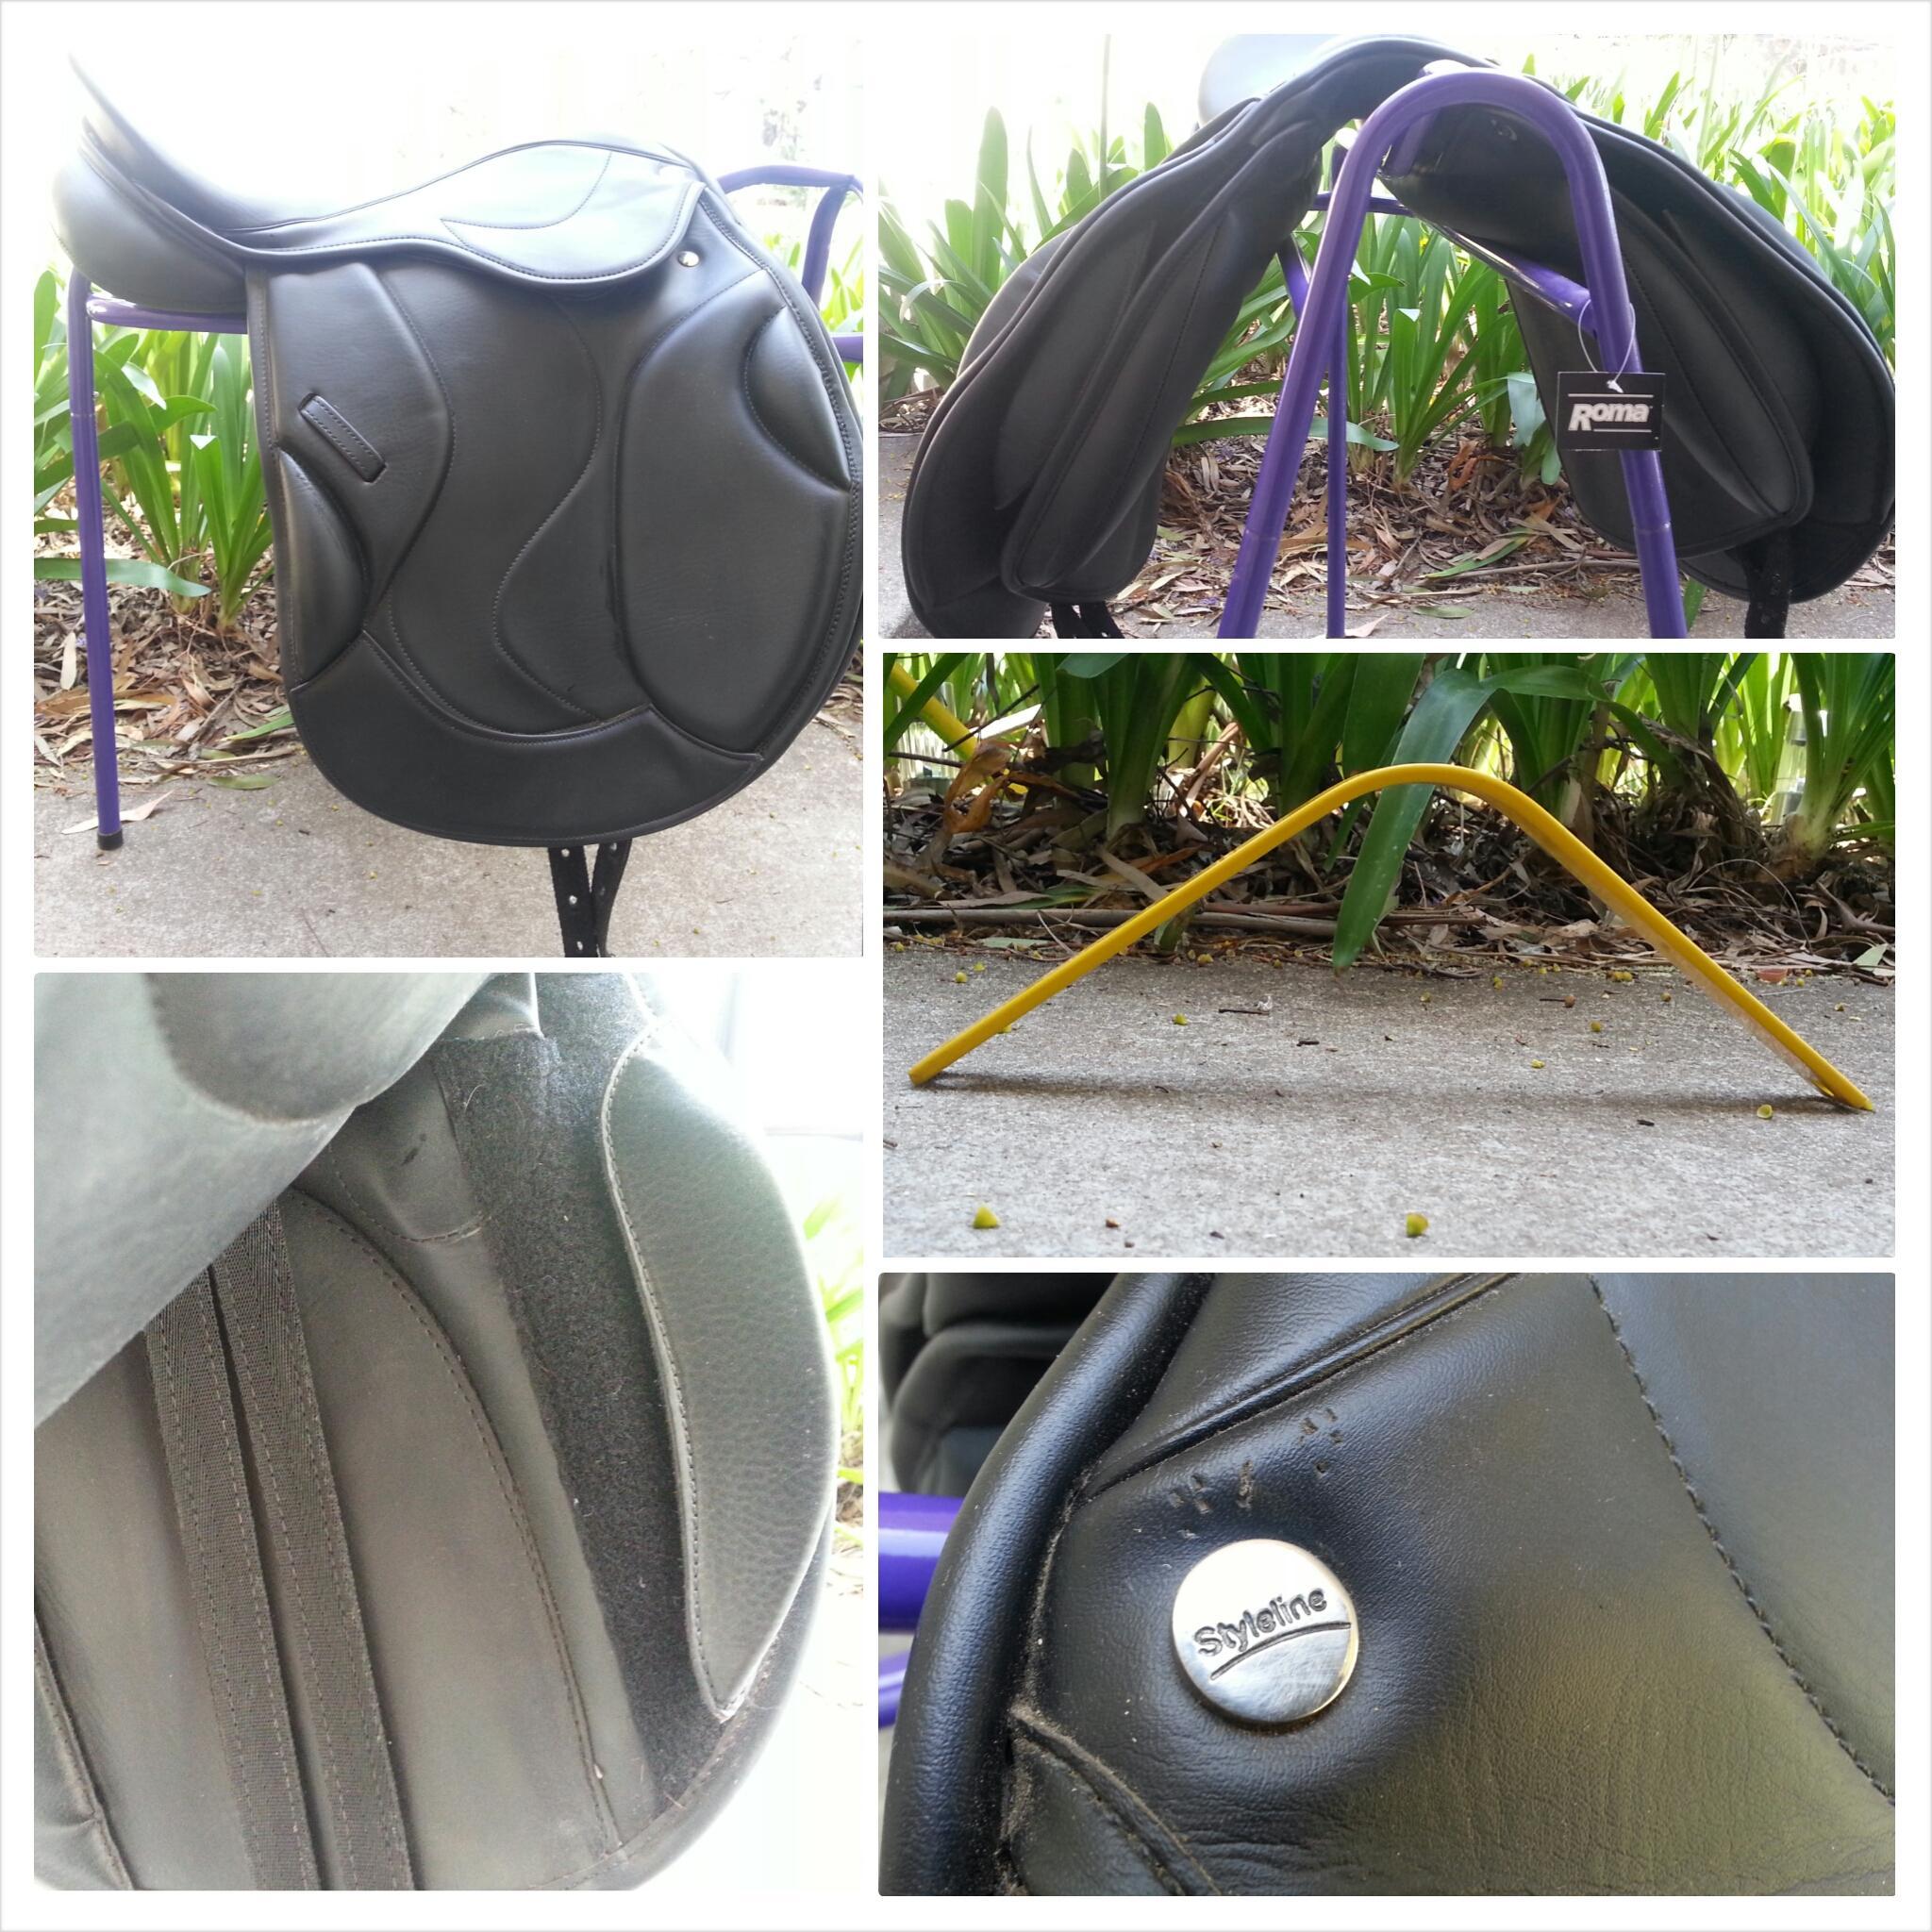 Styleline synthetic 17 inch AP saddle